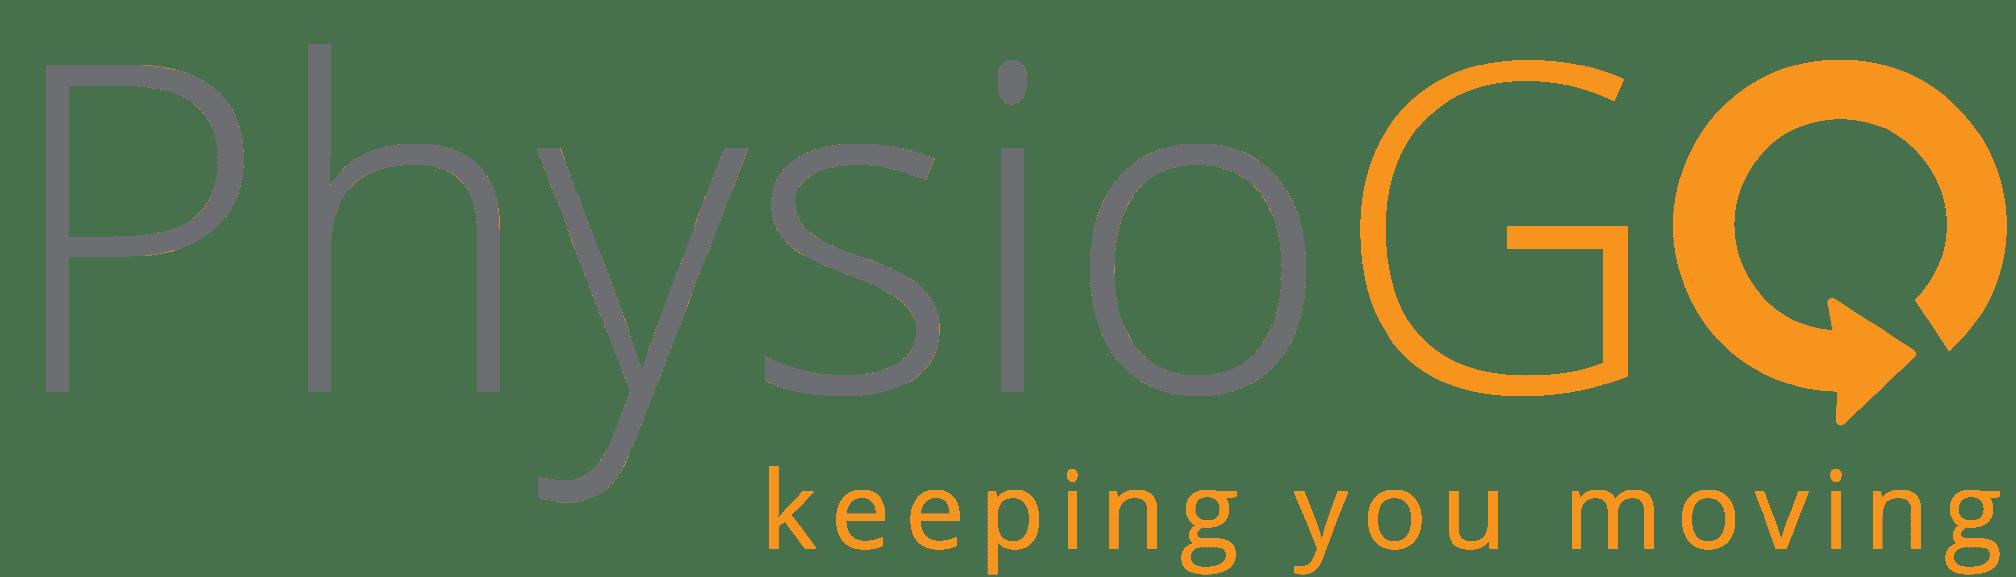 PhysioGo Physiotherapy Clinics Hesketh Bank | Unit 2, 10 Station Road, Preston PR4 6SN | +44 7516 395524